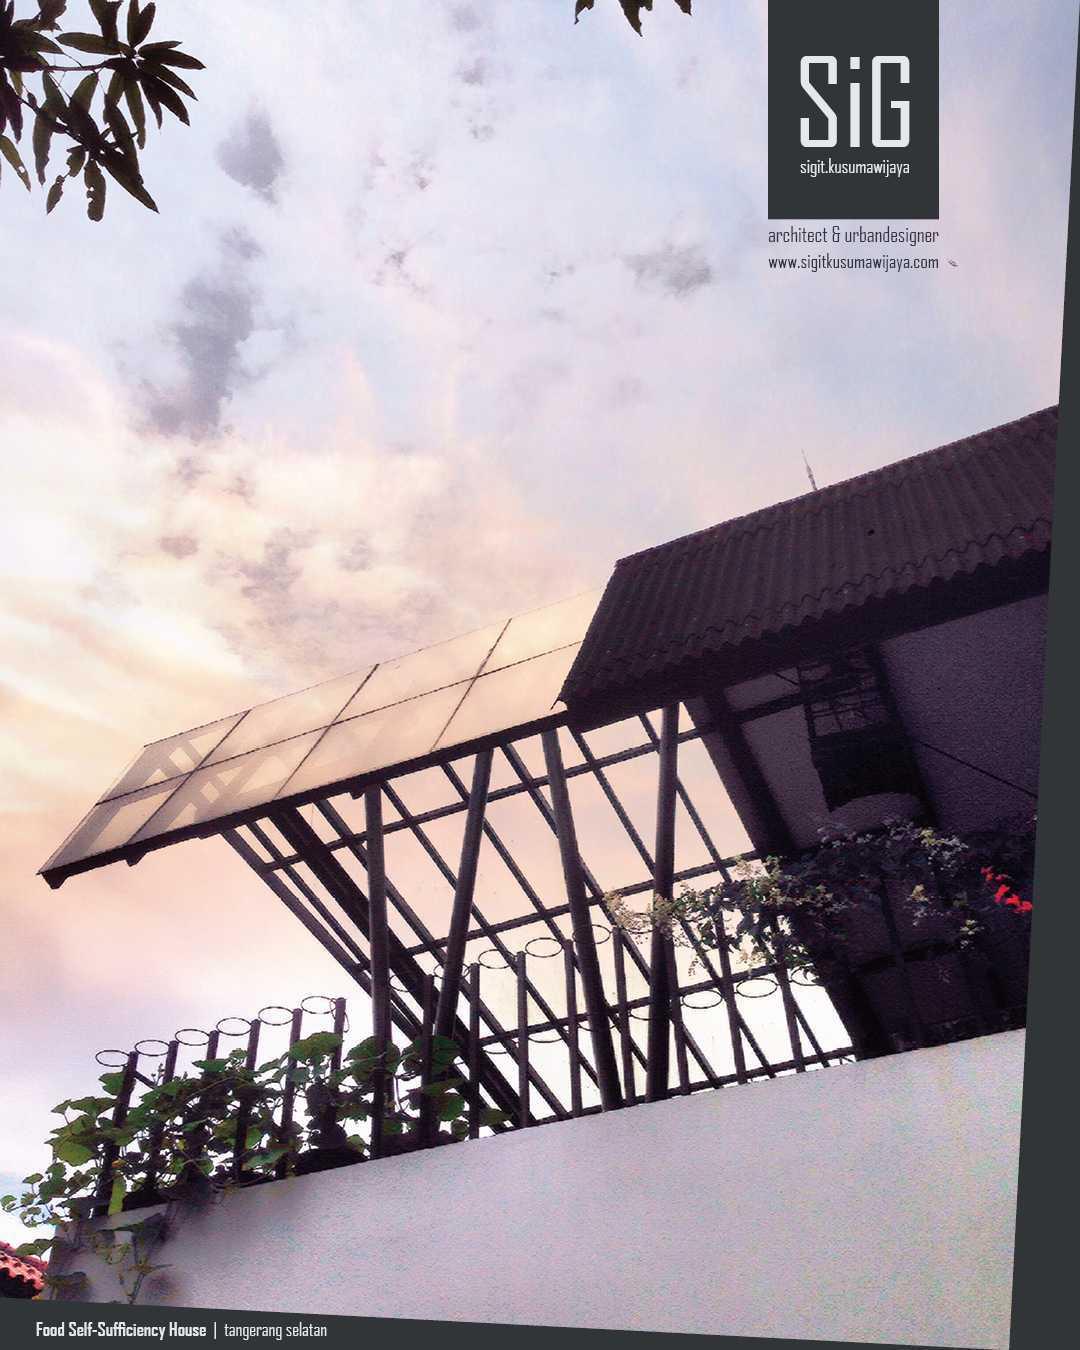 Sigit.kusumawijaya | Architect & Urbandesigner Rumah Kebun Mandiri Pangan (Food Self-Sufficiency House) Kota Tgr. Sel., Kota Tangerang Selatan, Banten, Indonesia Kota Tgr. Sel., Kota Tangerang Selatan, Banten, Indonesia Sigitkusumawijaya-Architect-Urbandesigner-Rumah-Kebun-Mandiri-Pangan-Food-Self-Sufficiency-House   55024